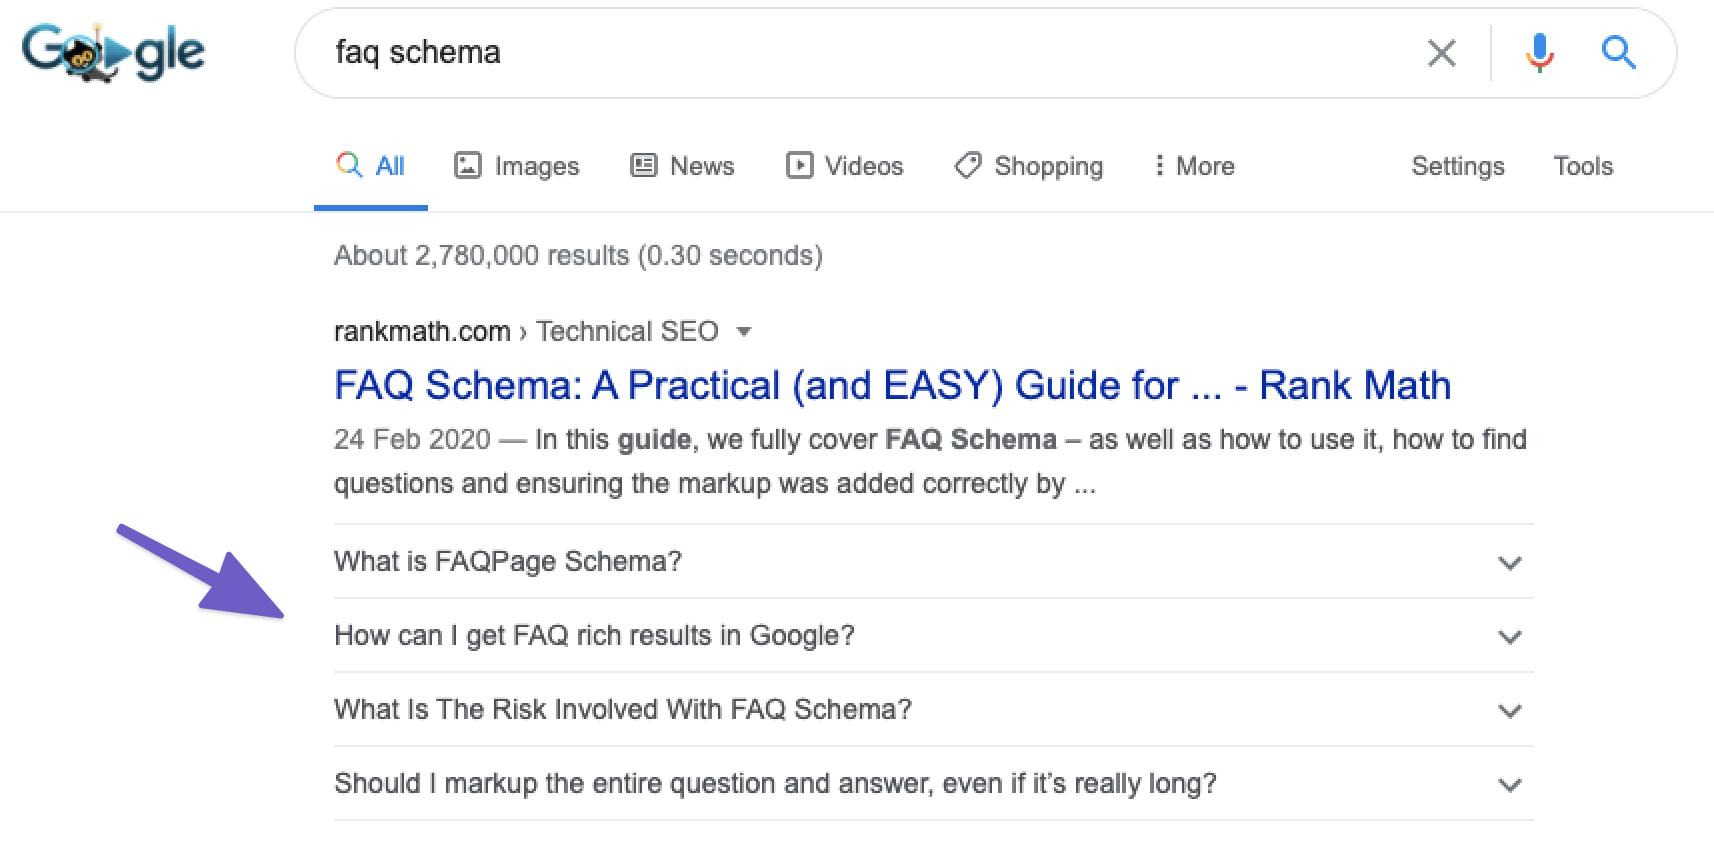 FAQ Schema 示例